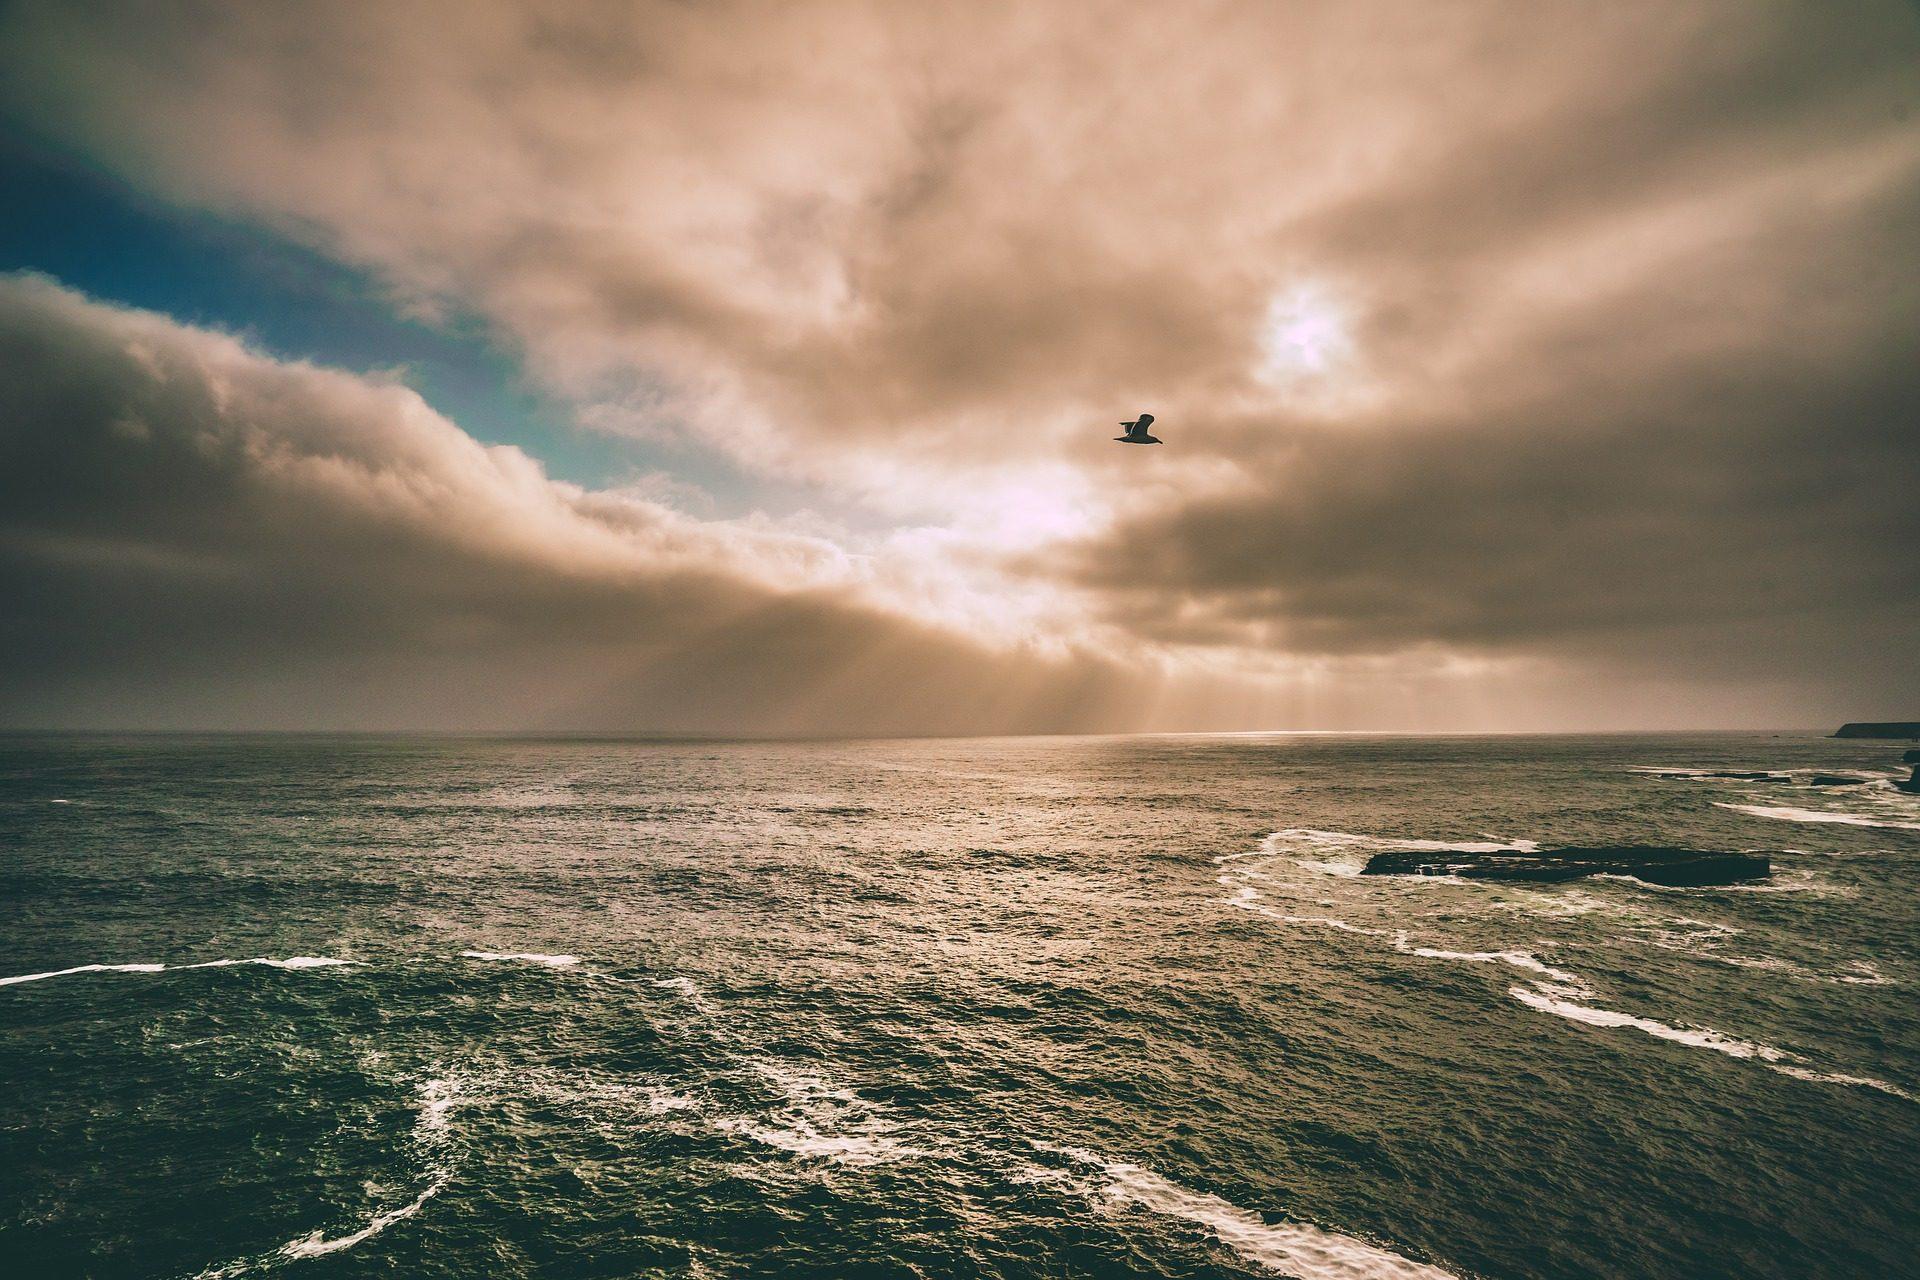 mar, océano, nubes, cielo, gaviota, inmensidad - Fondos de Pantalla HD - professor-falken.com